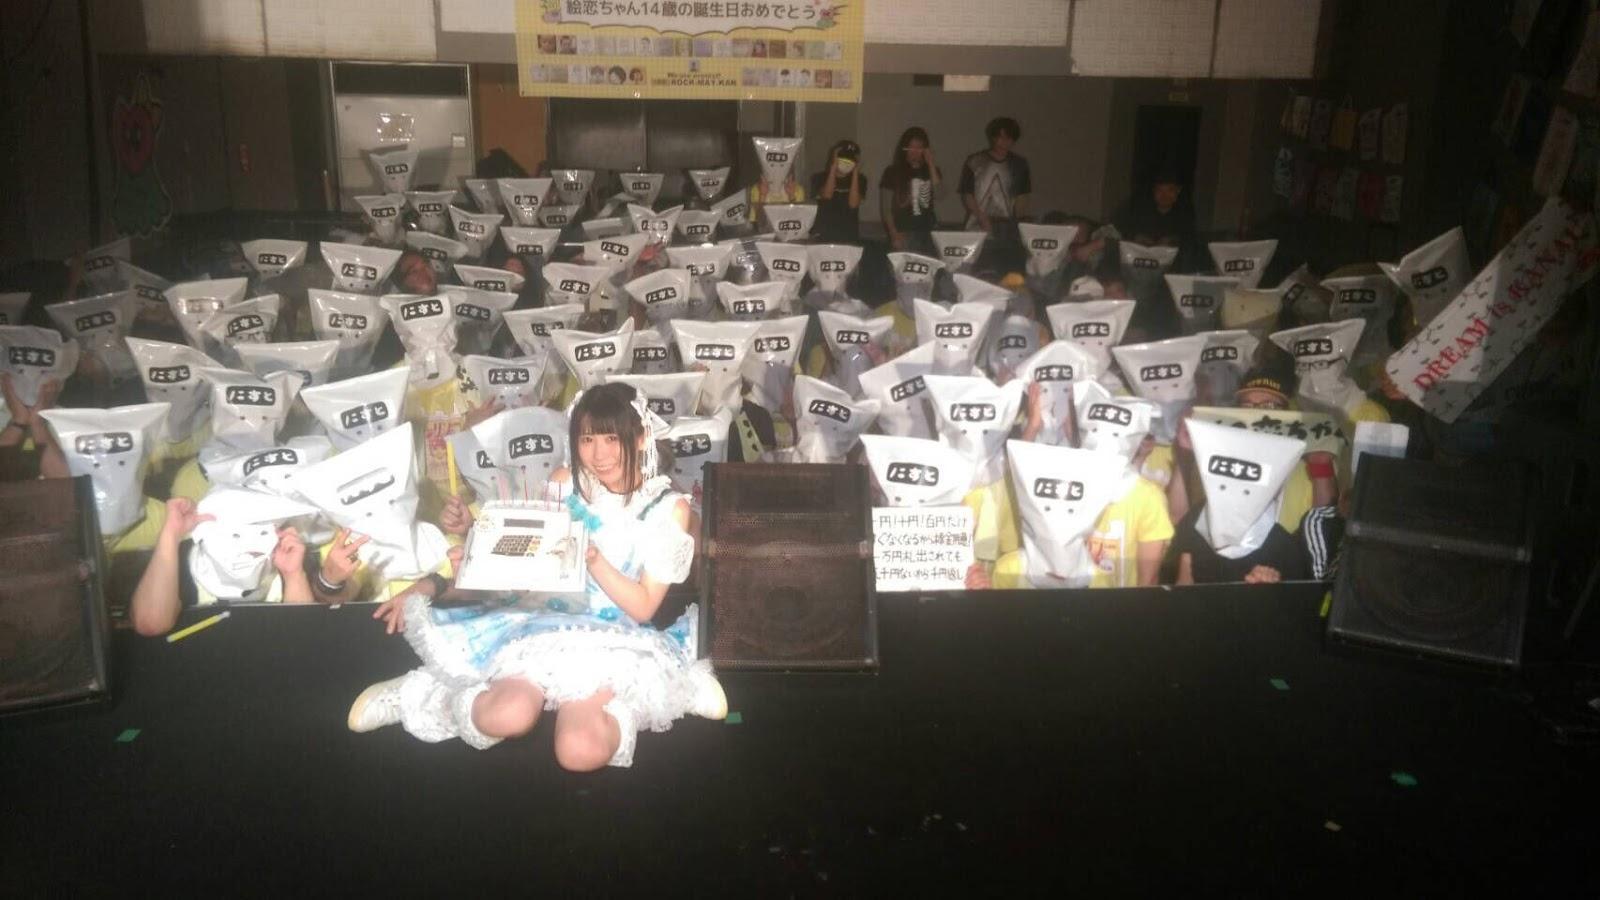 Idol diz odiar rostos de otakus